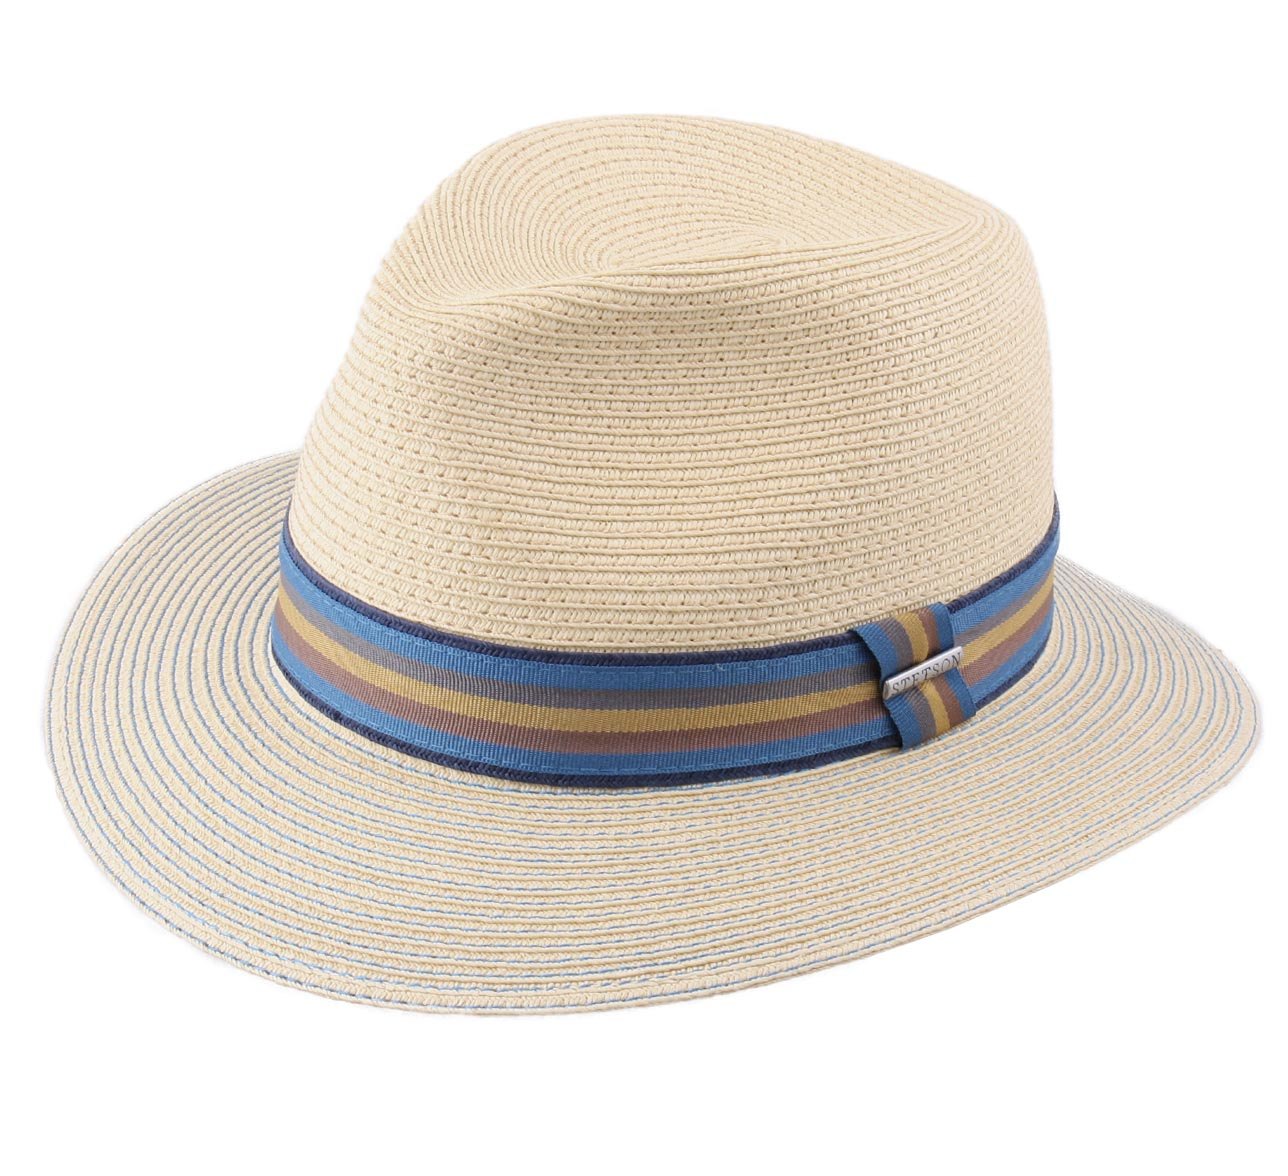 7941461488c Traveller toyo - Hats Stetson